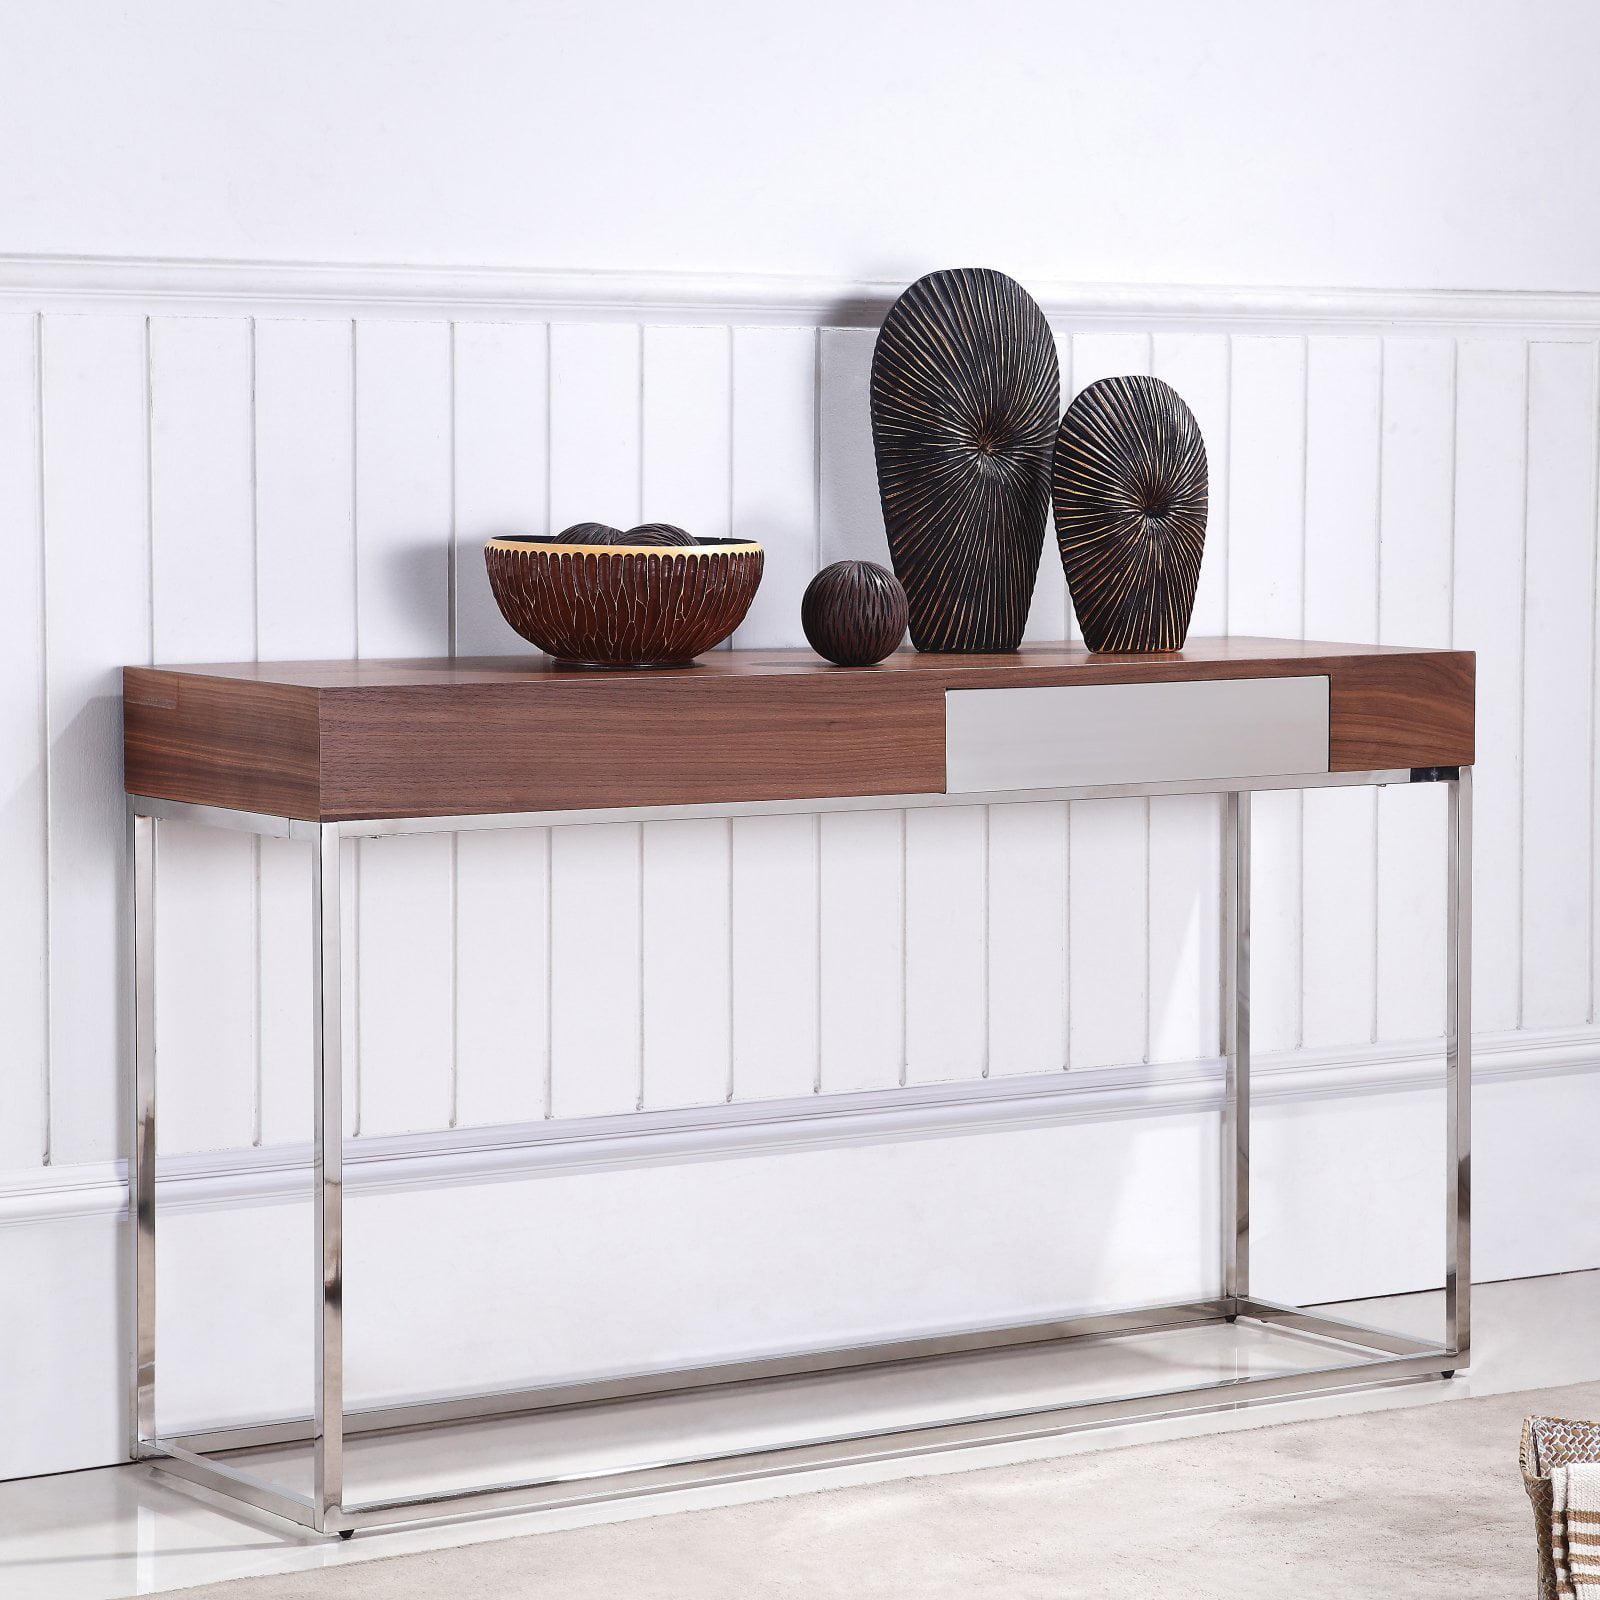 Talenti Casa Giga Collection Walnut Veneer Console Table